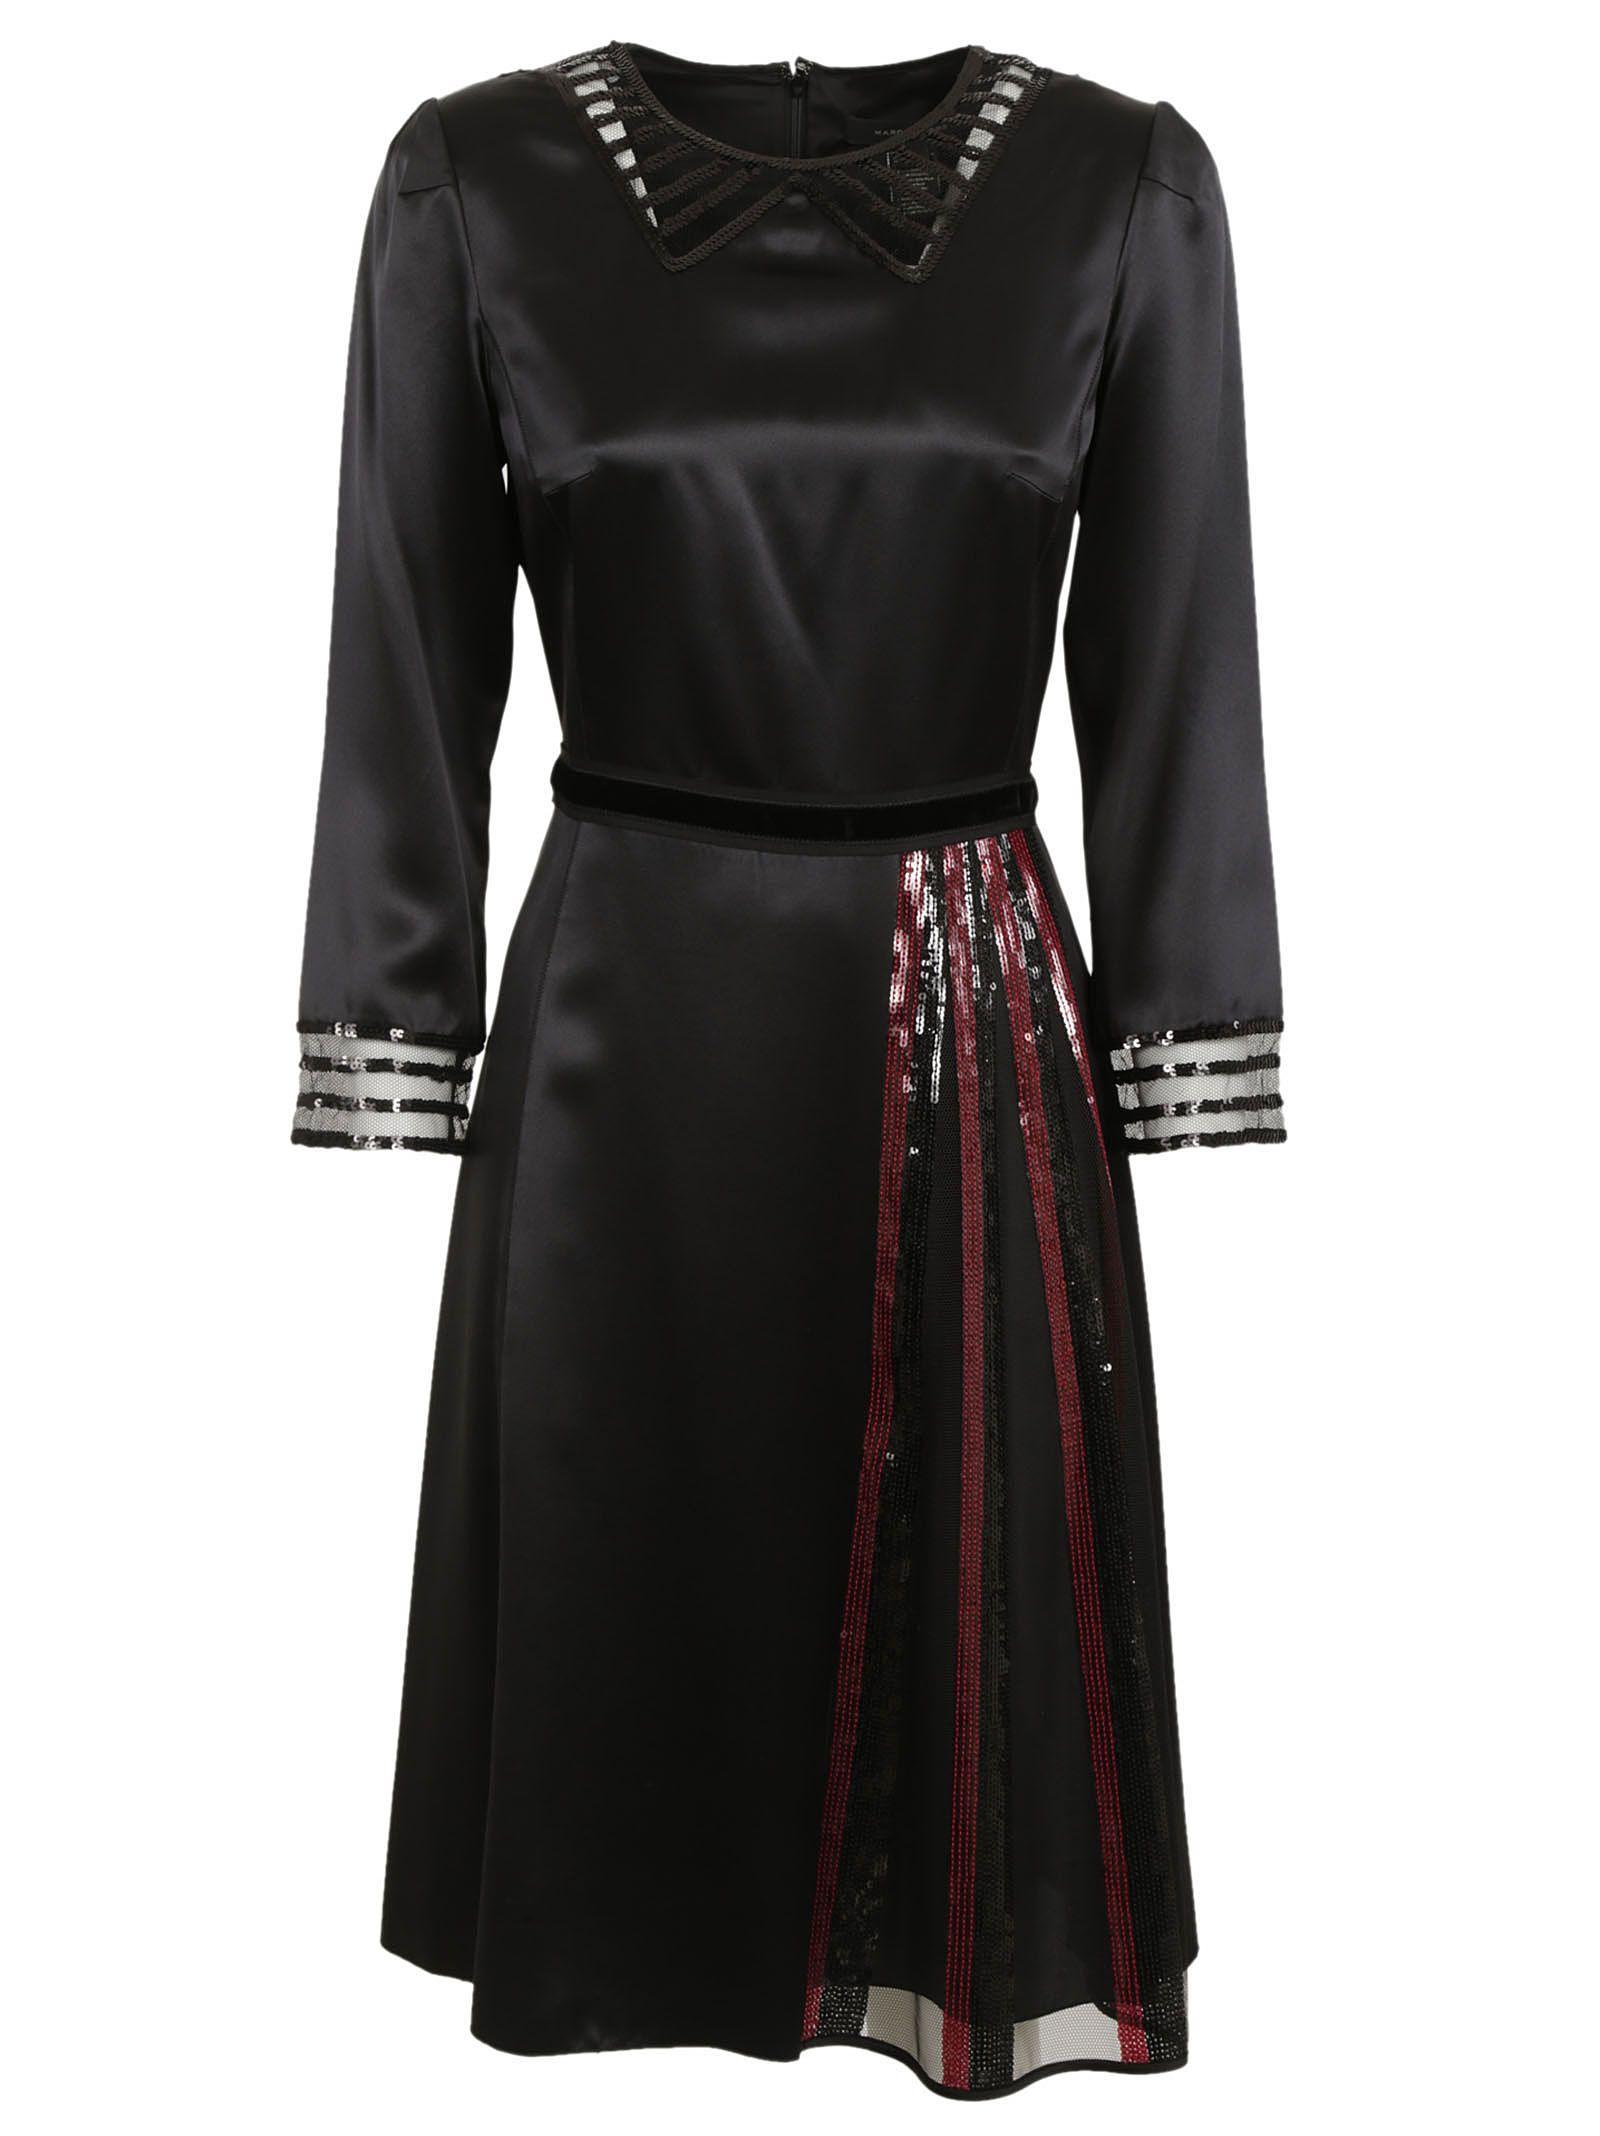 marc jacobs female marc jacobs dress